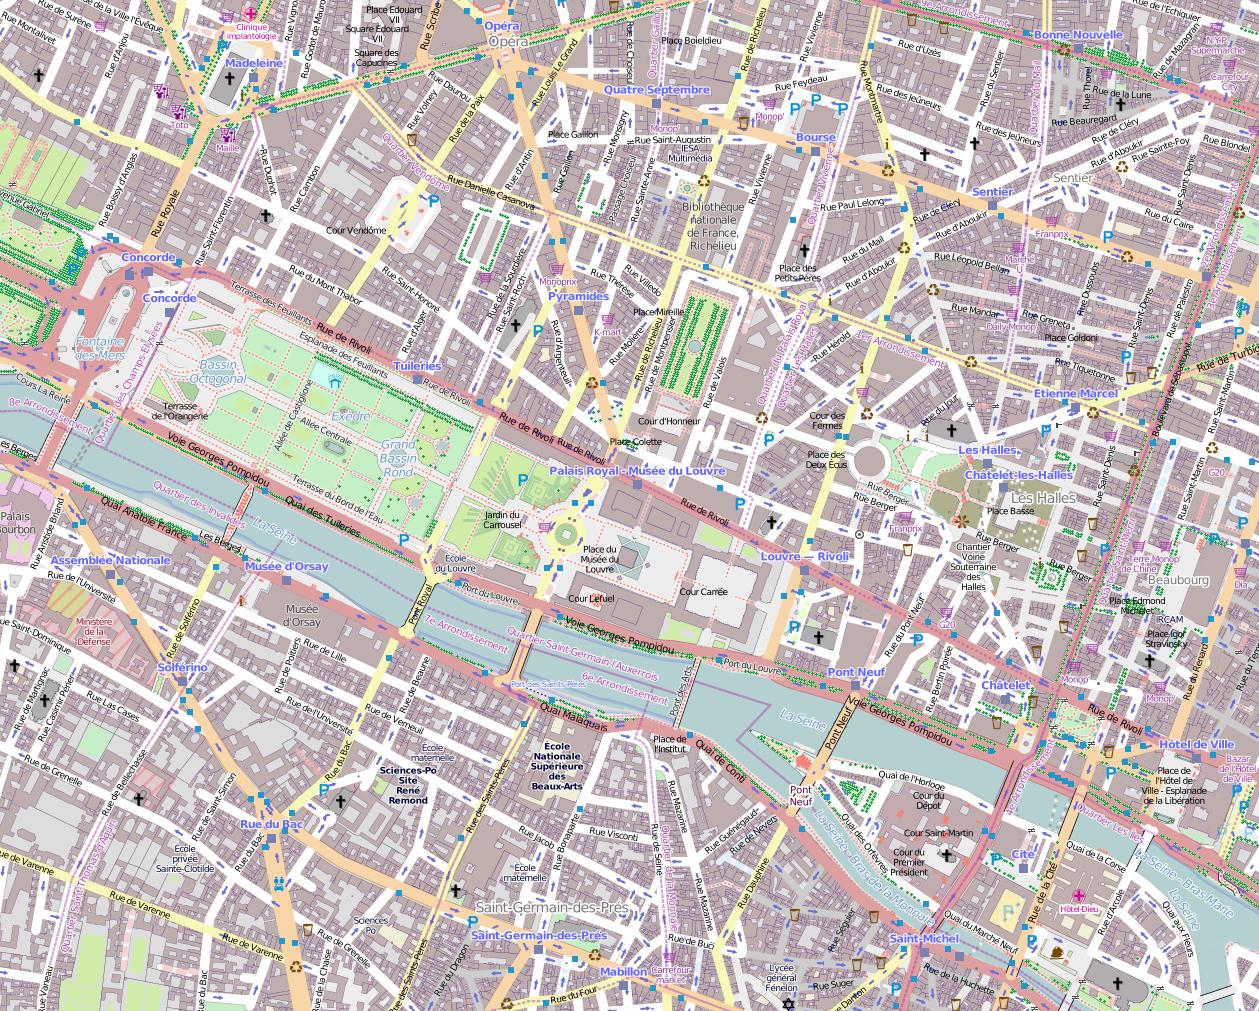 Index of molivergeo – Street Map of Paris Pdf